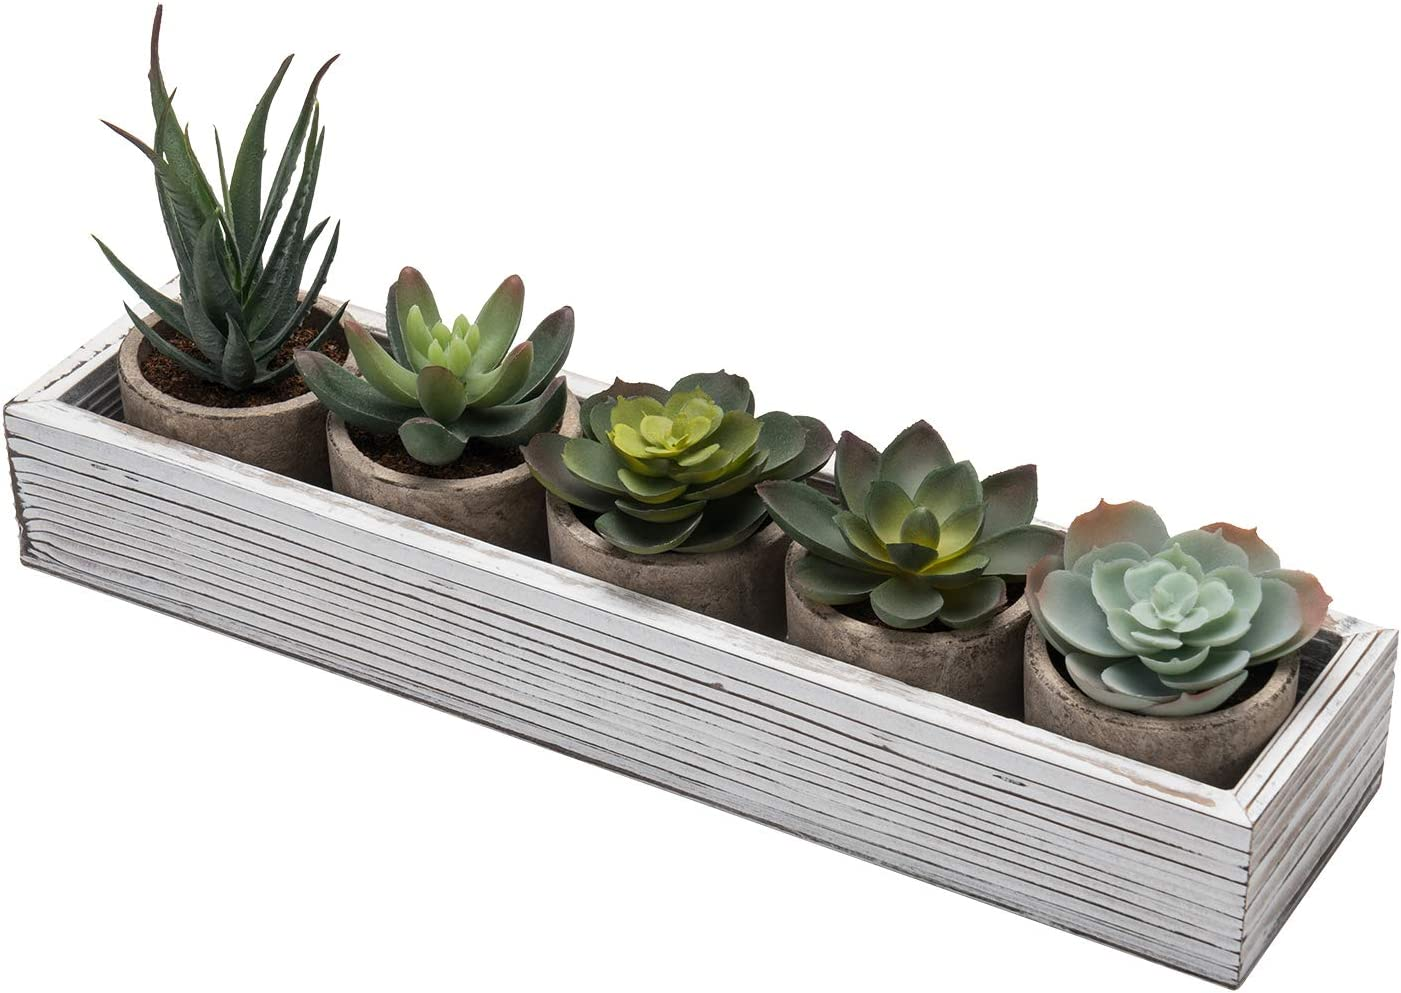 MoonLa Set of 5 Mini Fake Succulent Faux Cactus Cacti Potted Plants Assorted Decorative Artificial Succulent Plants with Gray Pots Wood Planter Arrangement